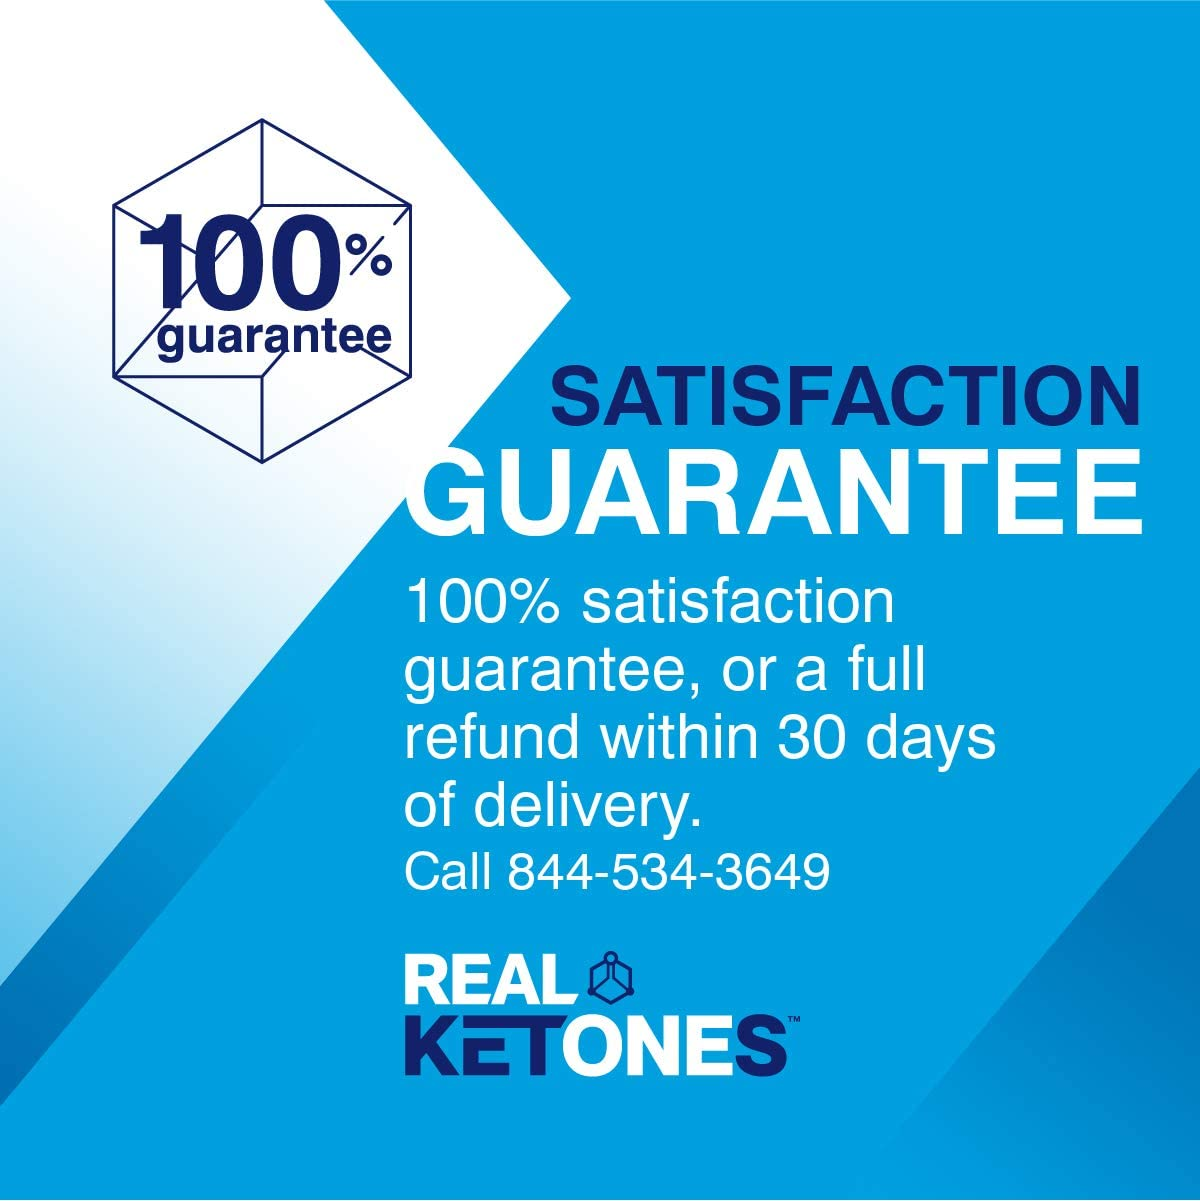 So How Does Real Ketones Keto Do The Job?